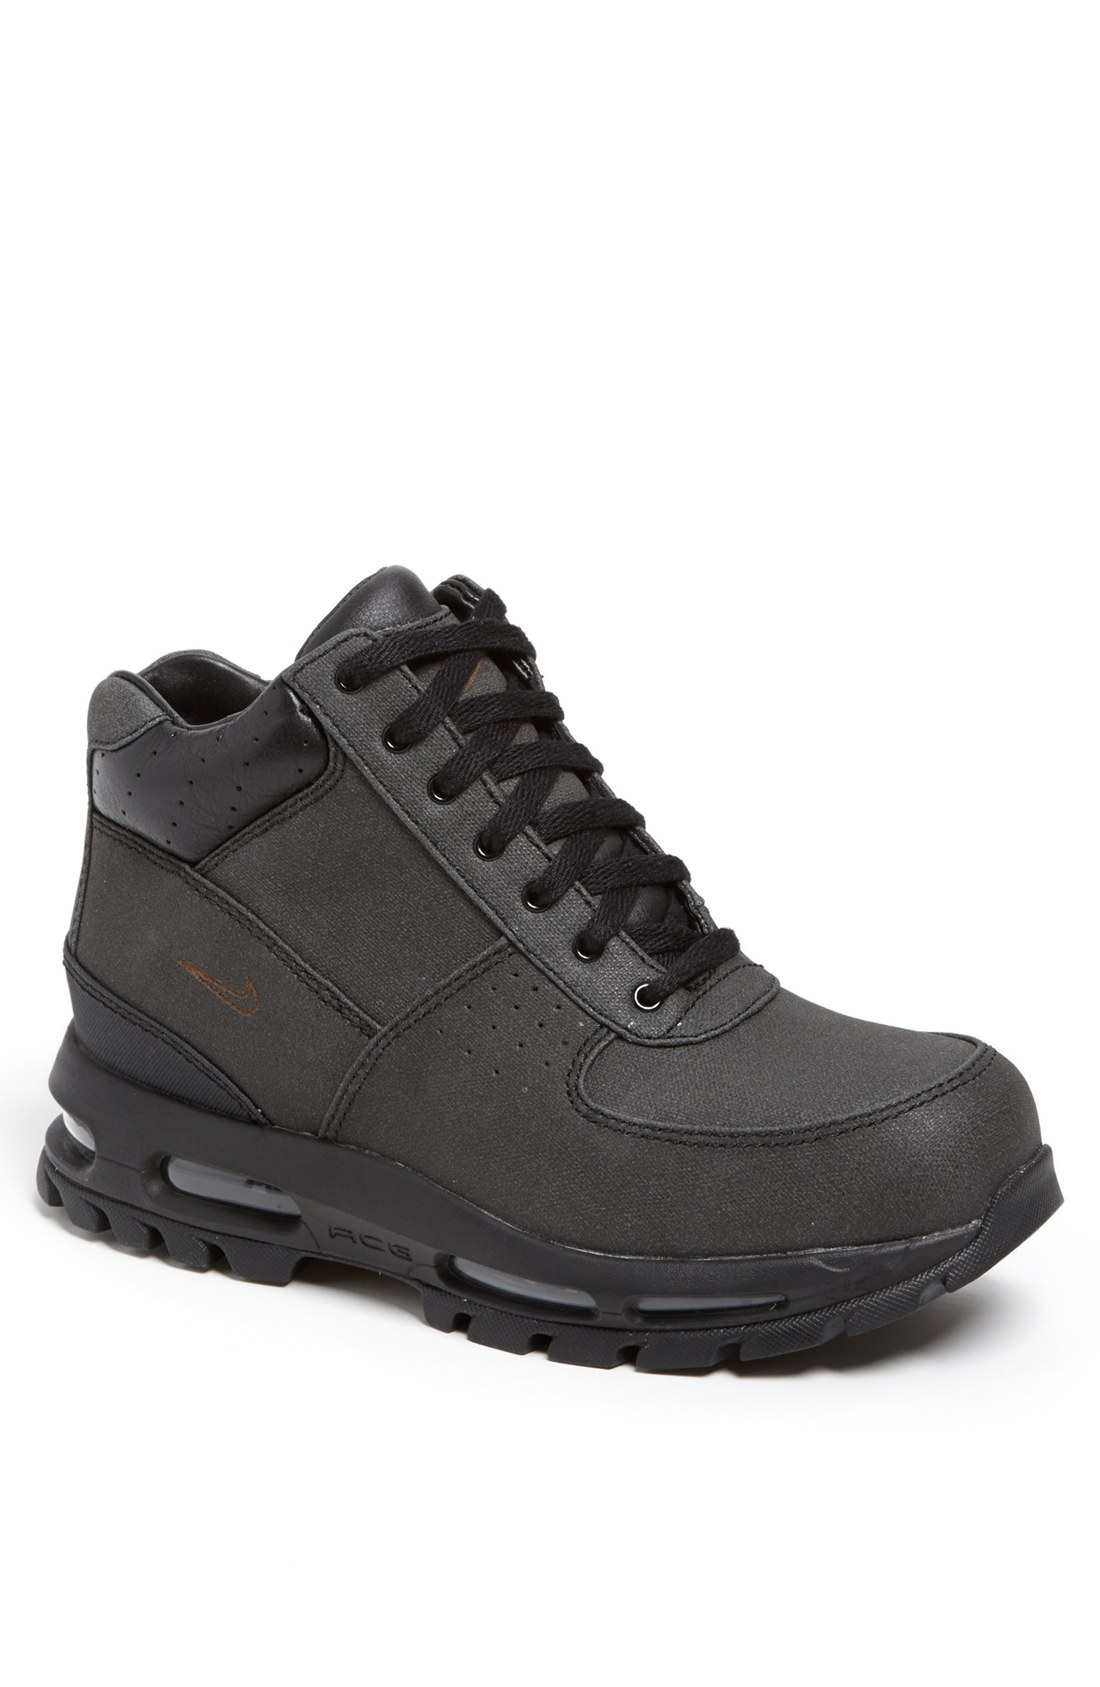 quality design 3f10f 8b672 Nike Max Boots - Ivoiregion